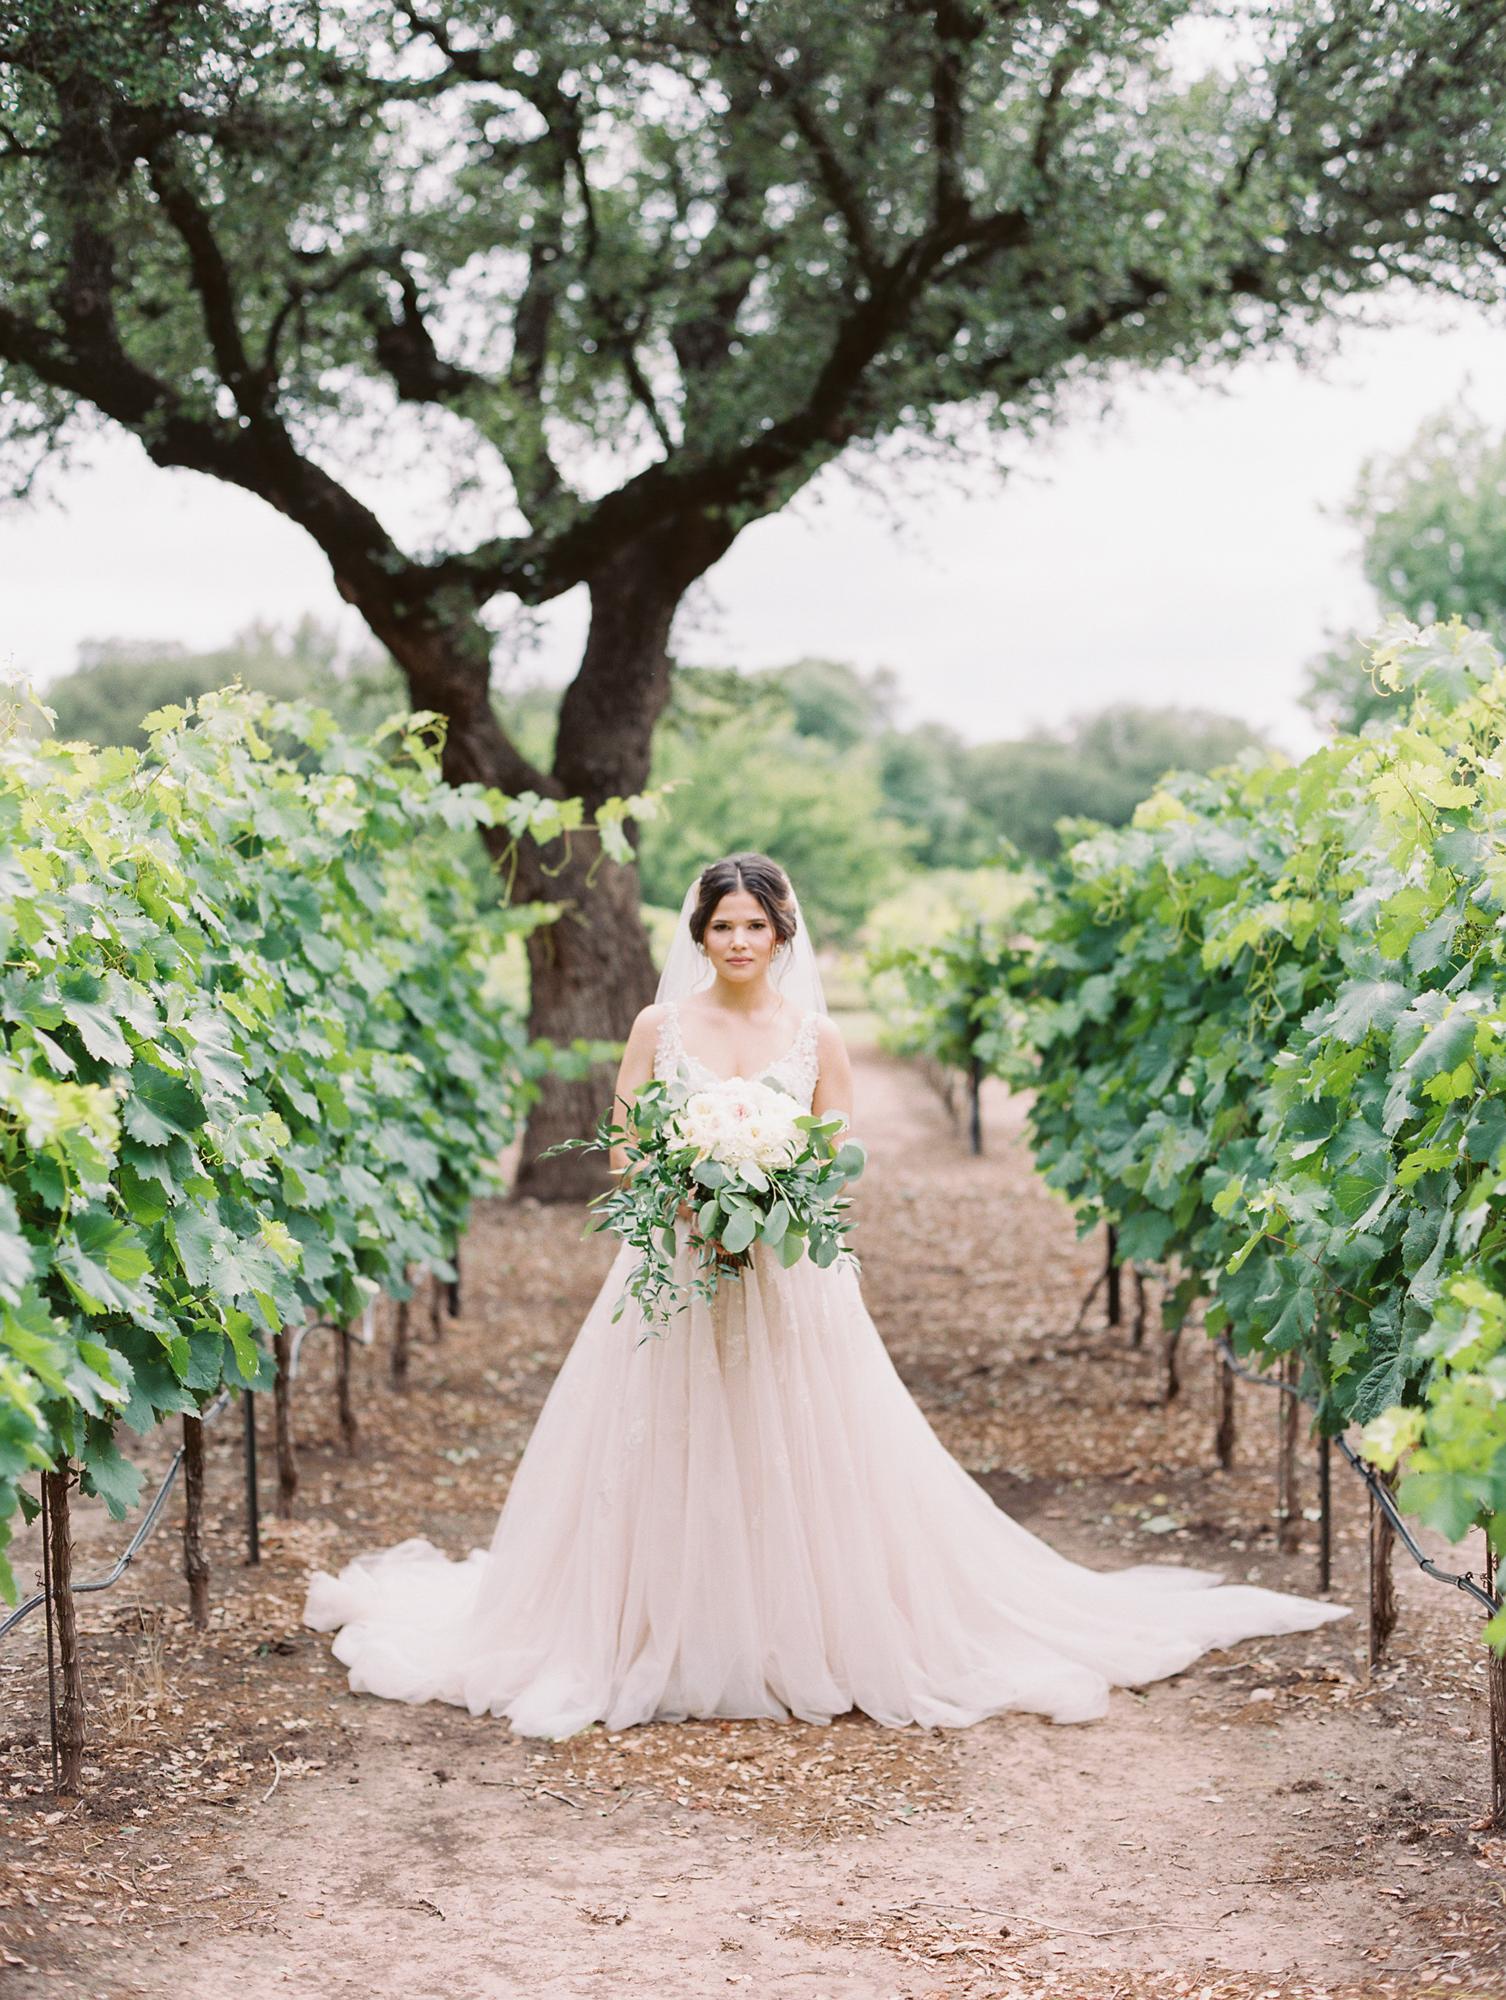 Elegant Spring Vineyard Wedding | Film Wedding Photographer | Austin Wedding Photographer | Bridal Wedding Day Portrait | Britni Dean Photography // britnidean.com